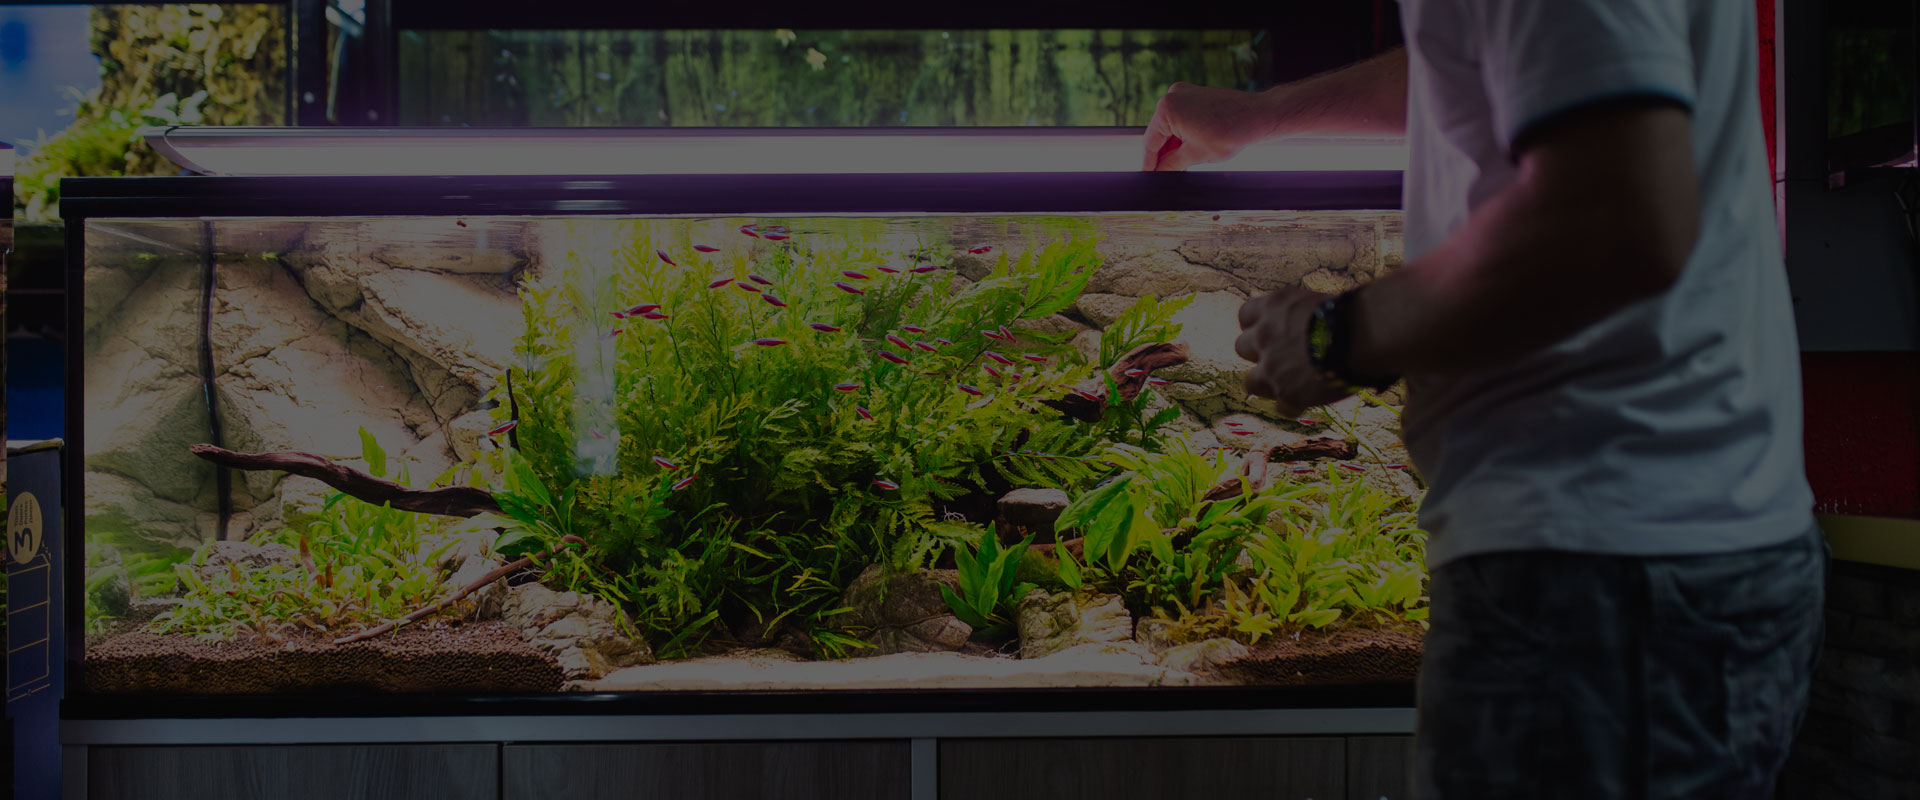 Aquariums : plantes et animaux